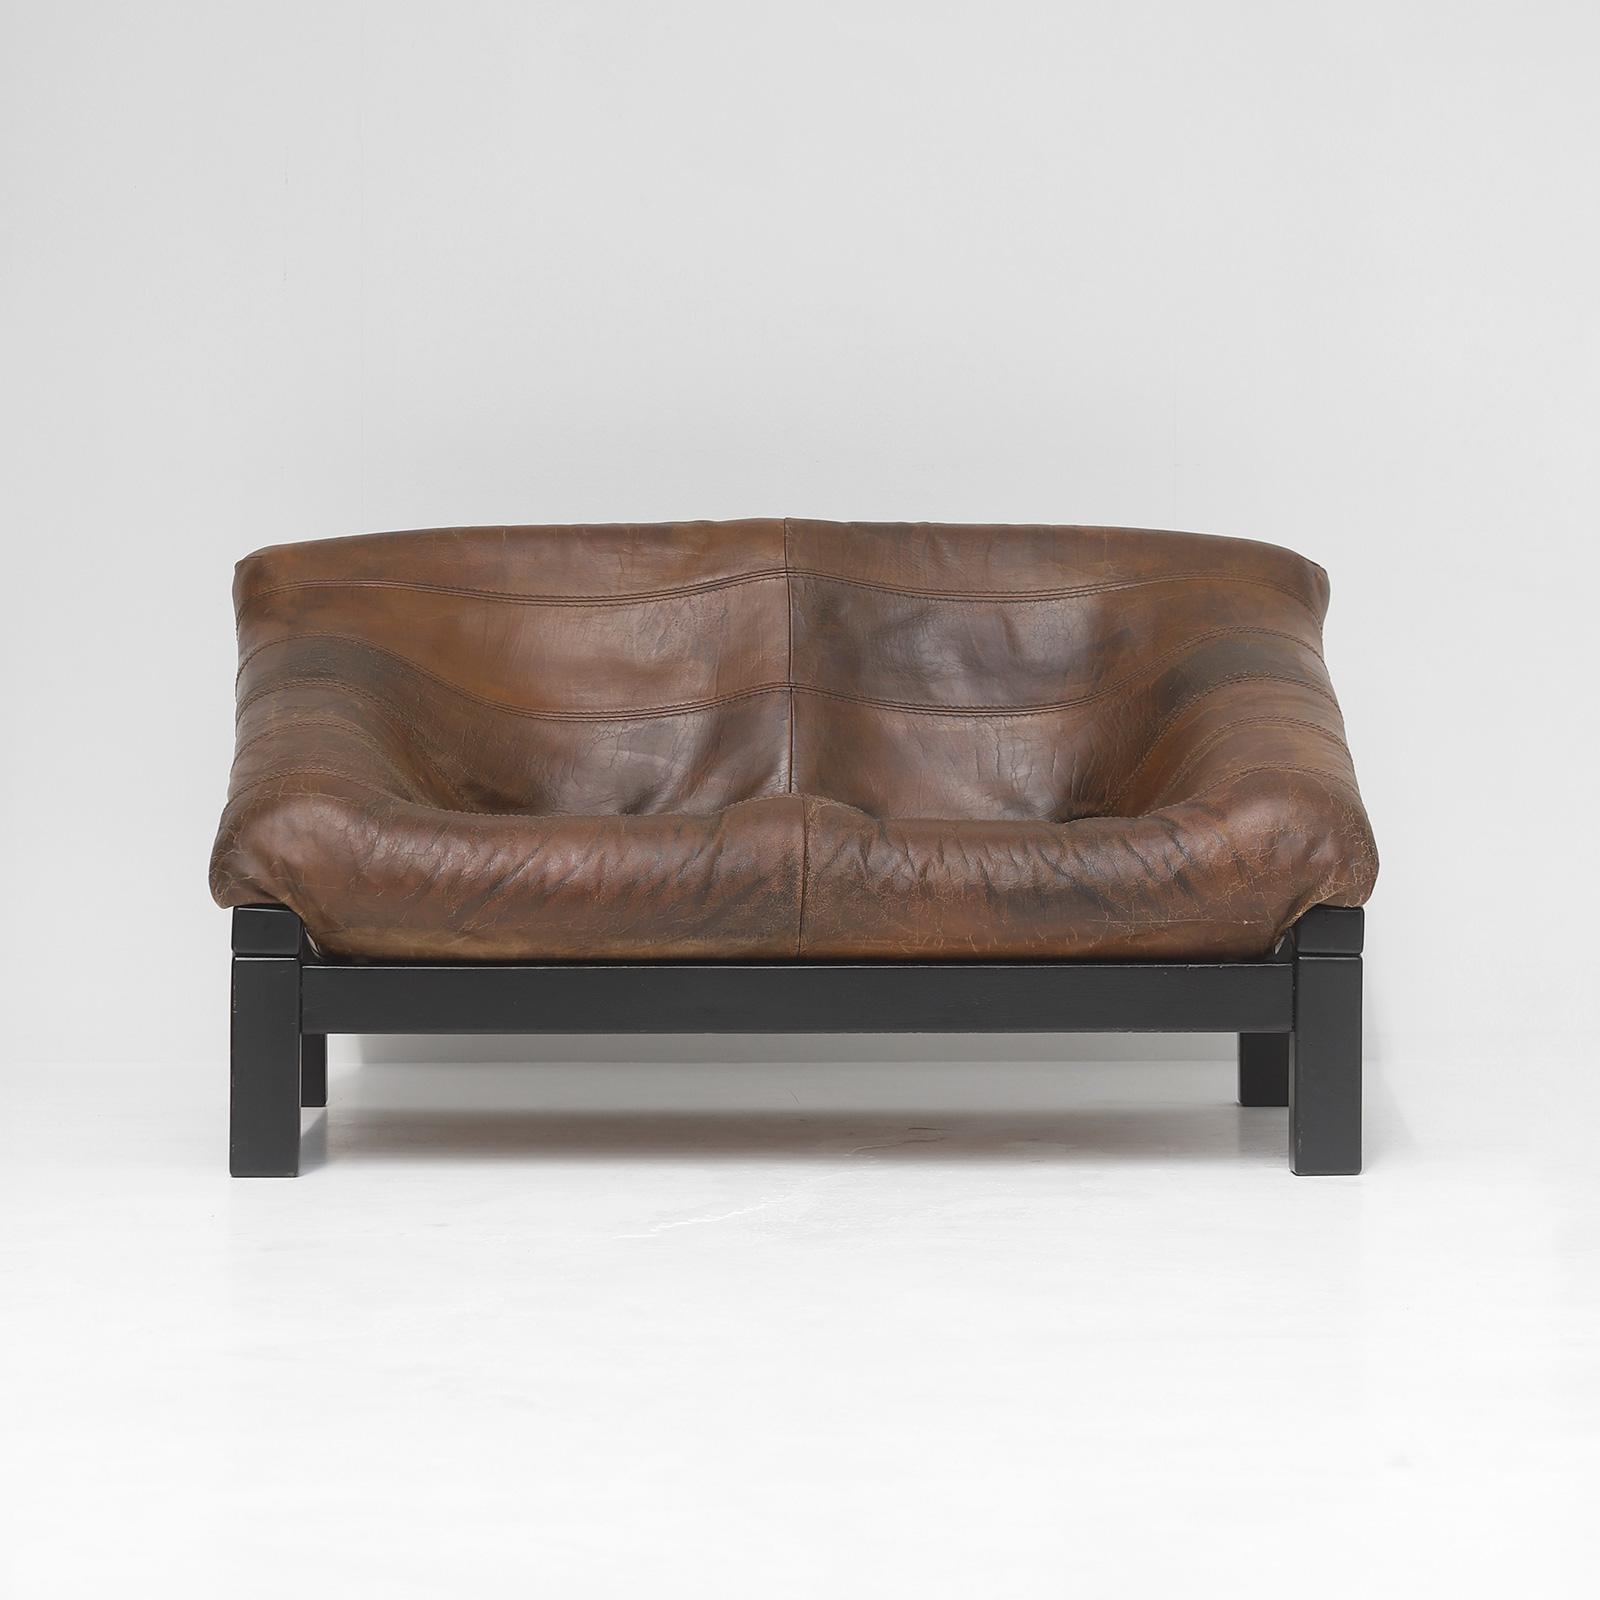 Decorative 2 seat leather Sofa